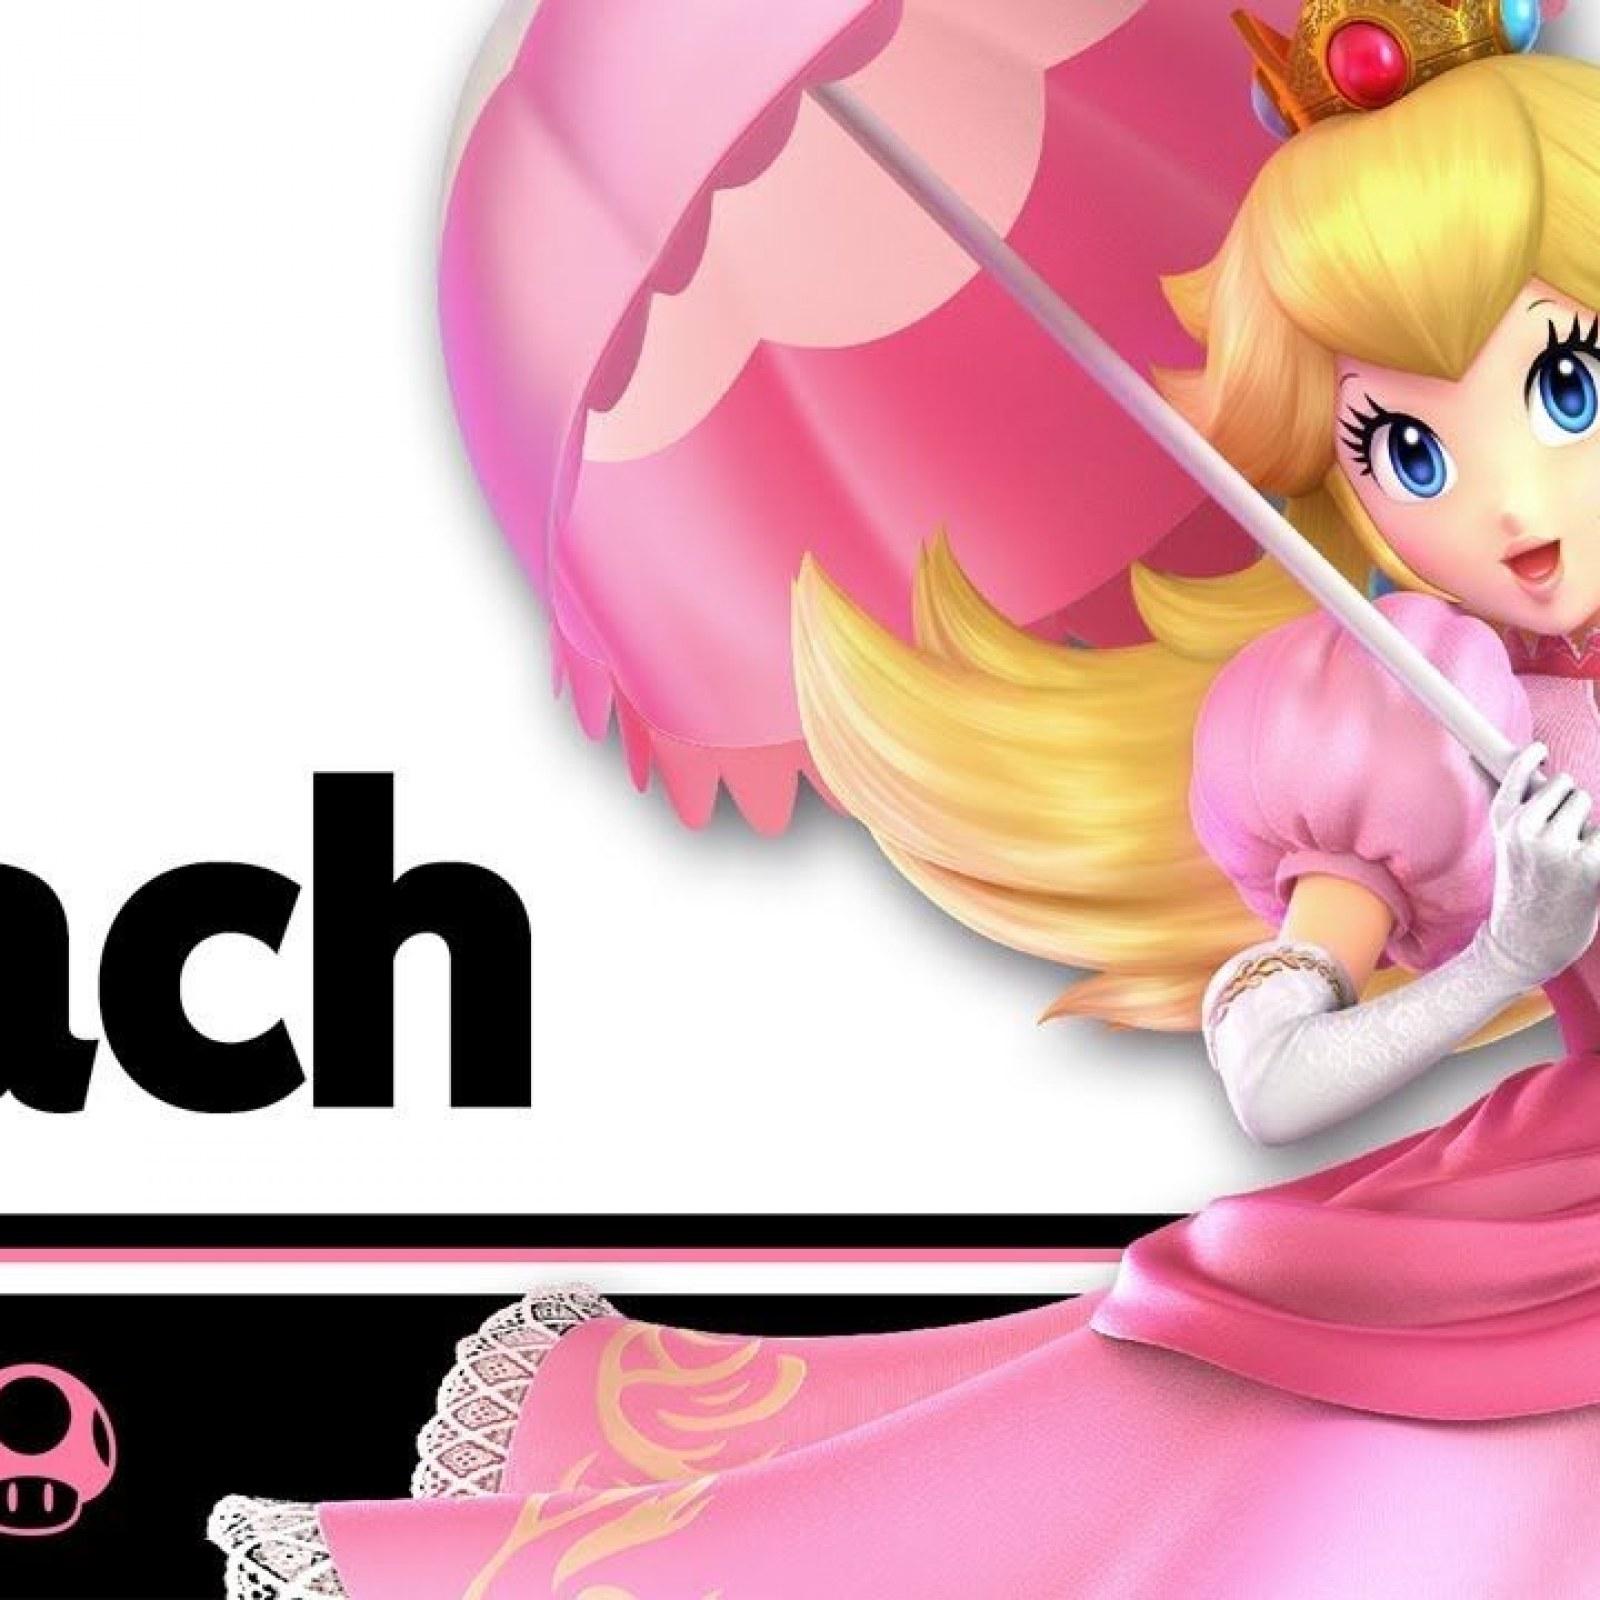 Smash Ultimate' Tier List: Leffen Crowns Peach as His Top